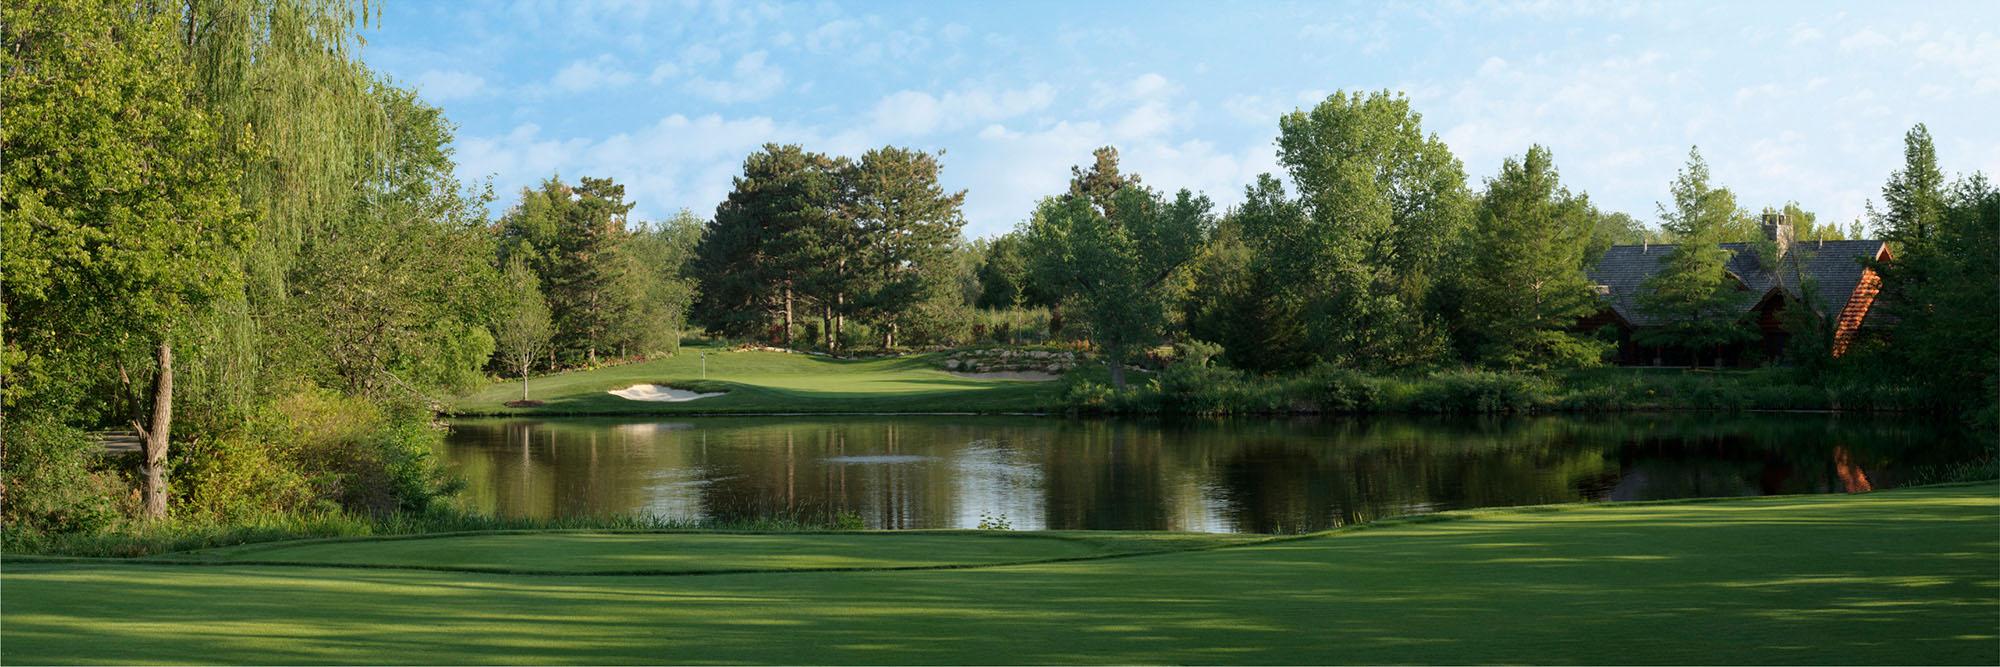 Flint Hills National Golf Club